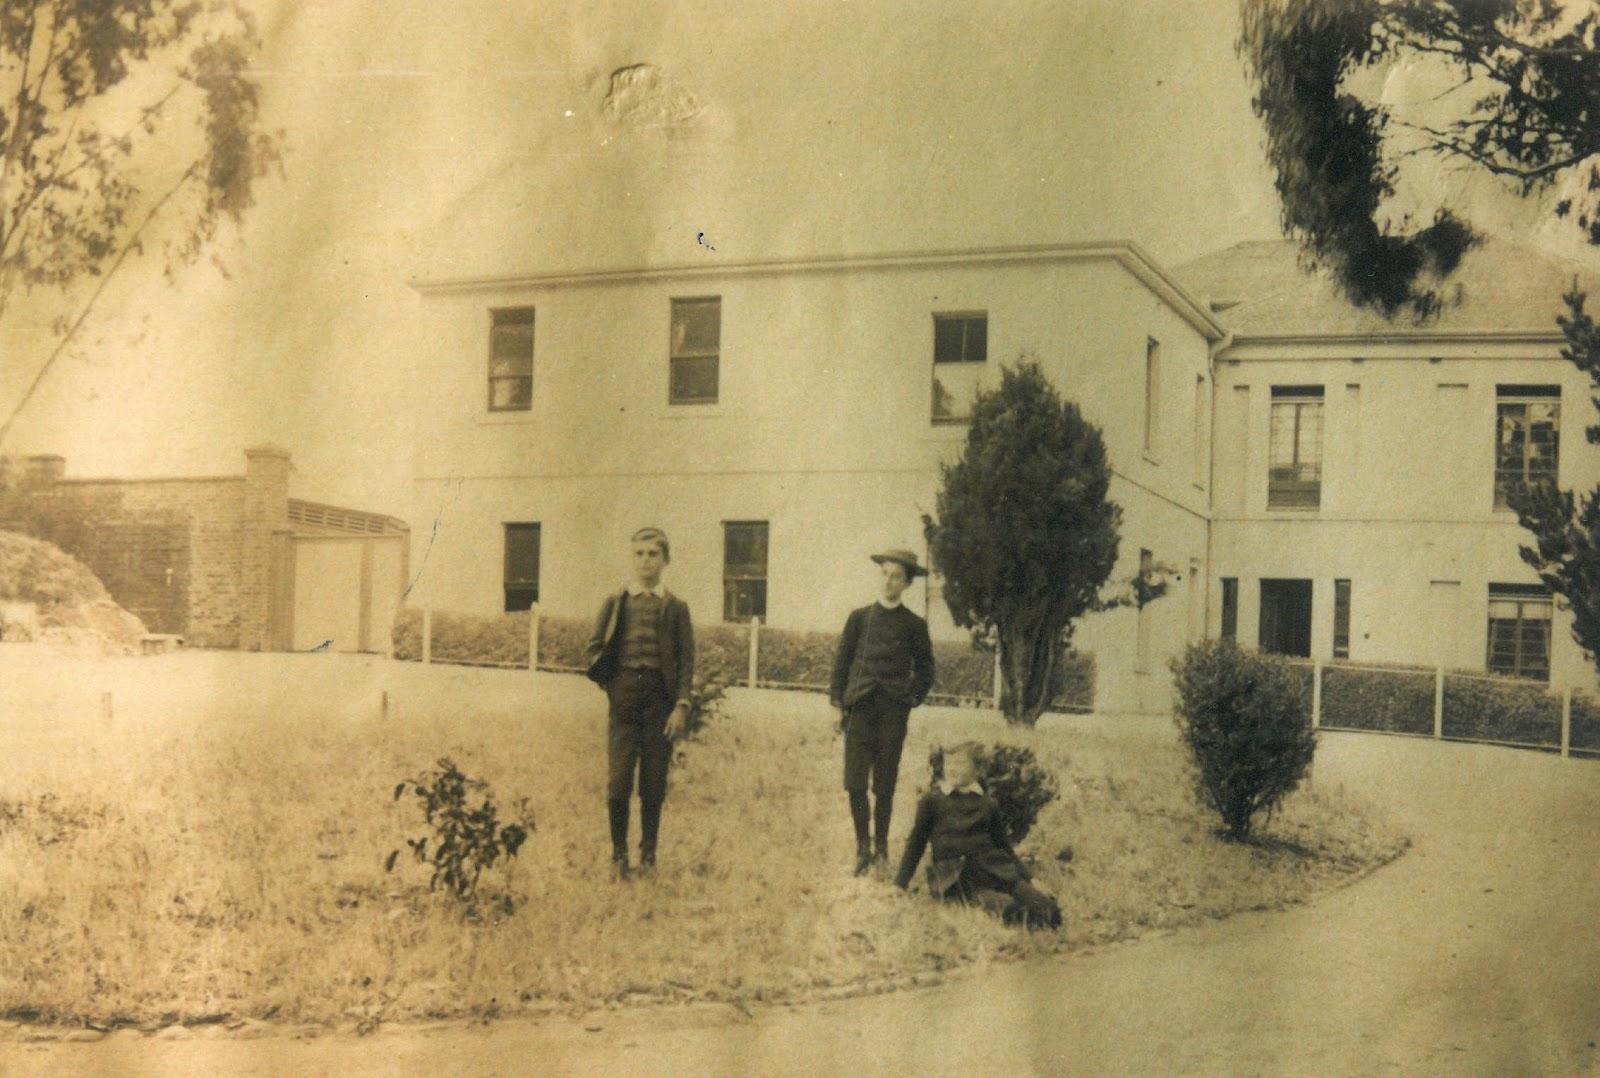 On The Convict Trail: Hobartville